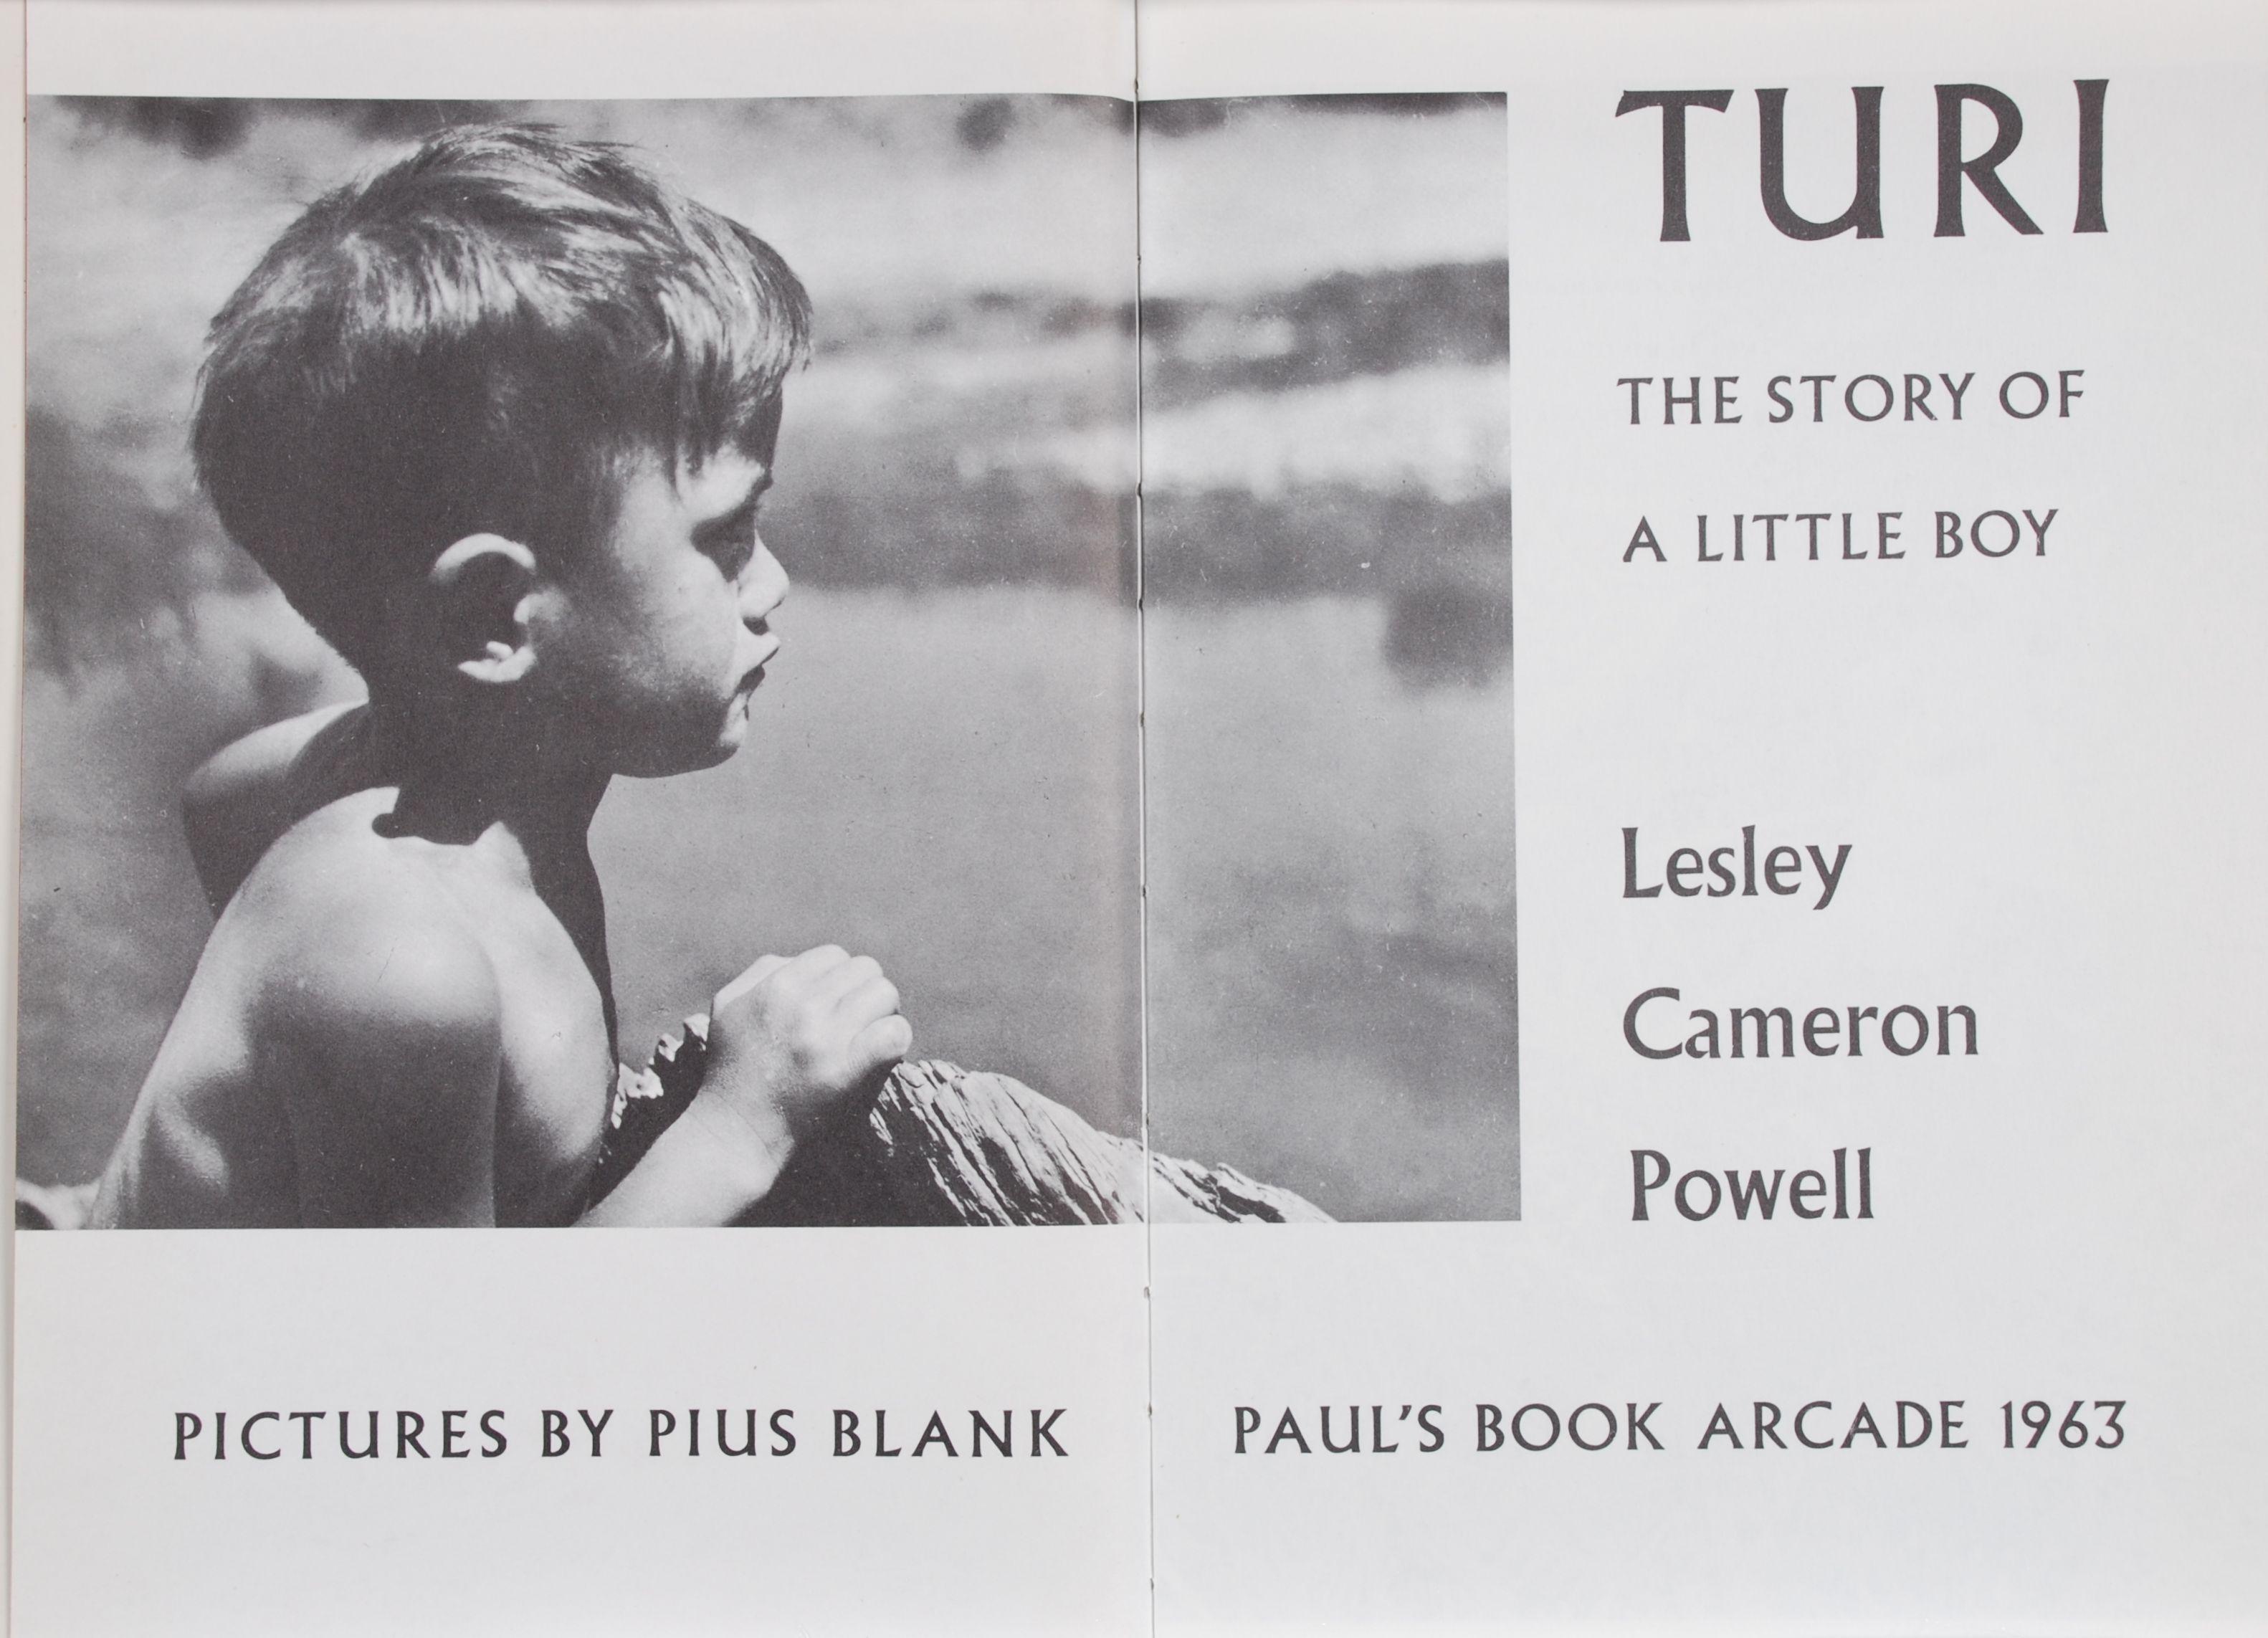 Lesley Cameron Powell. Turi: the story of a little boy.  New Zealand: Paul's Book Arcade, 1963